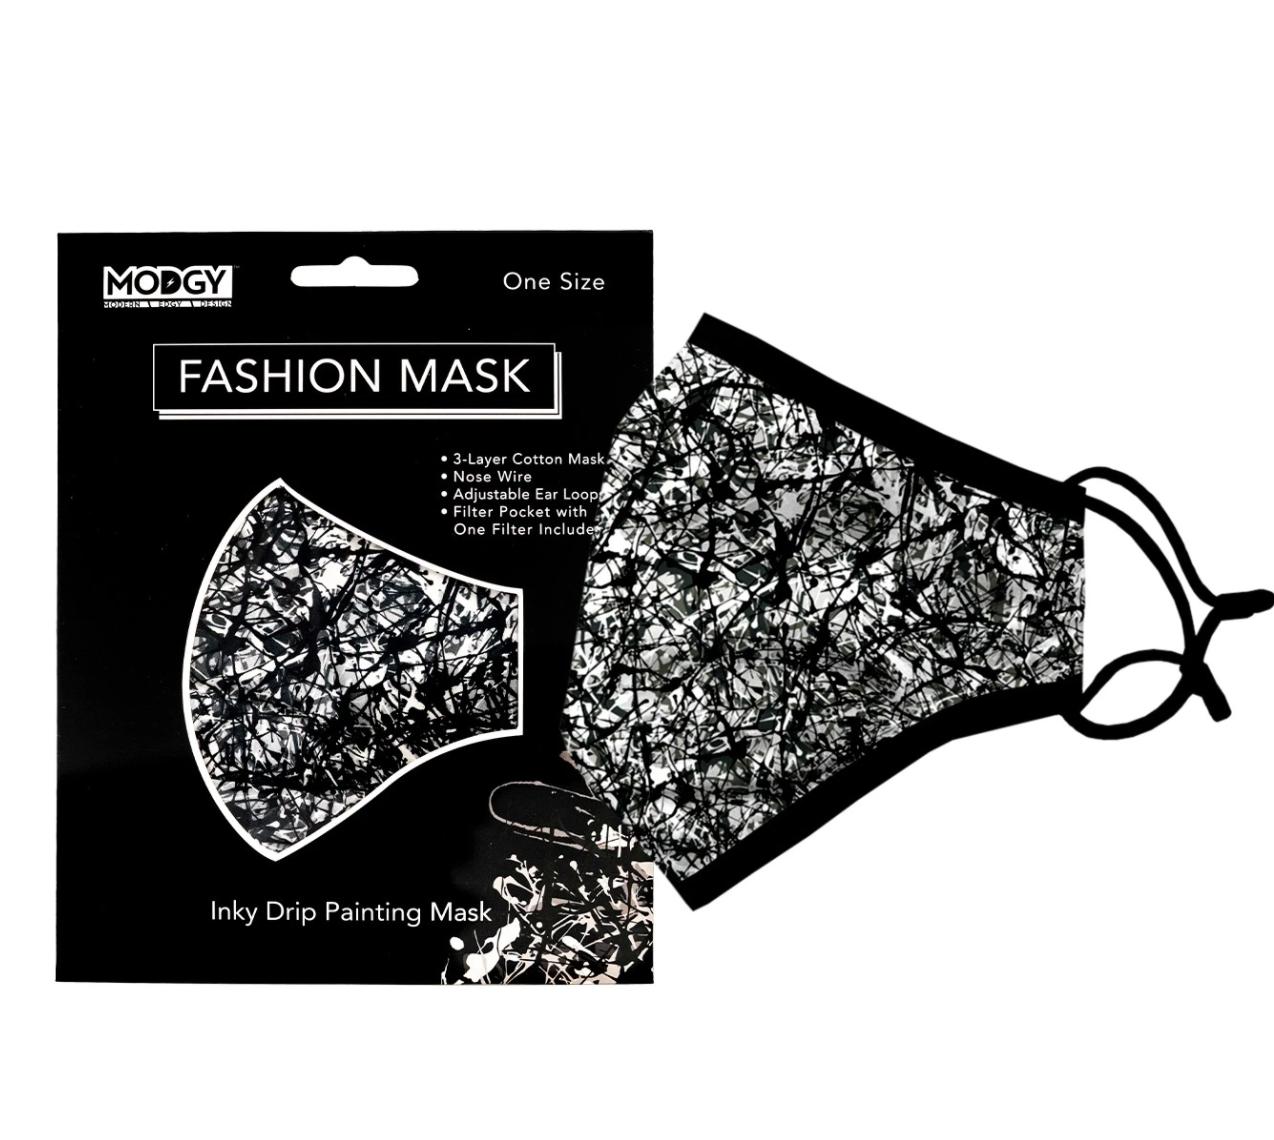 Modgy Face Mask